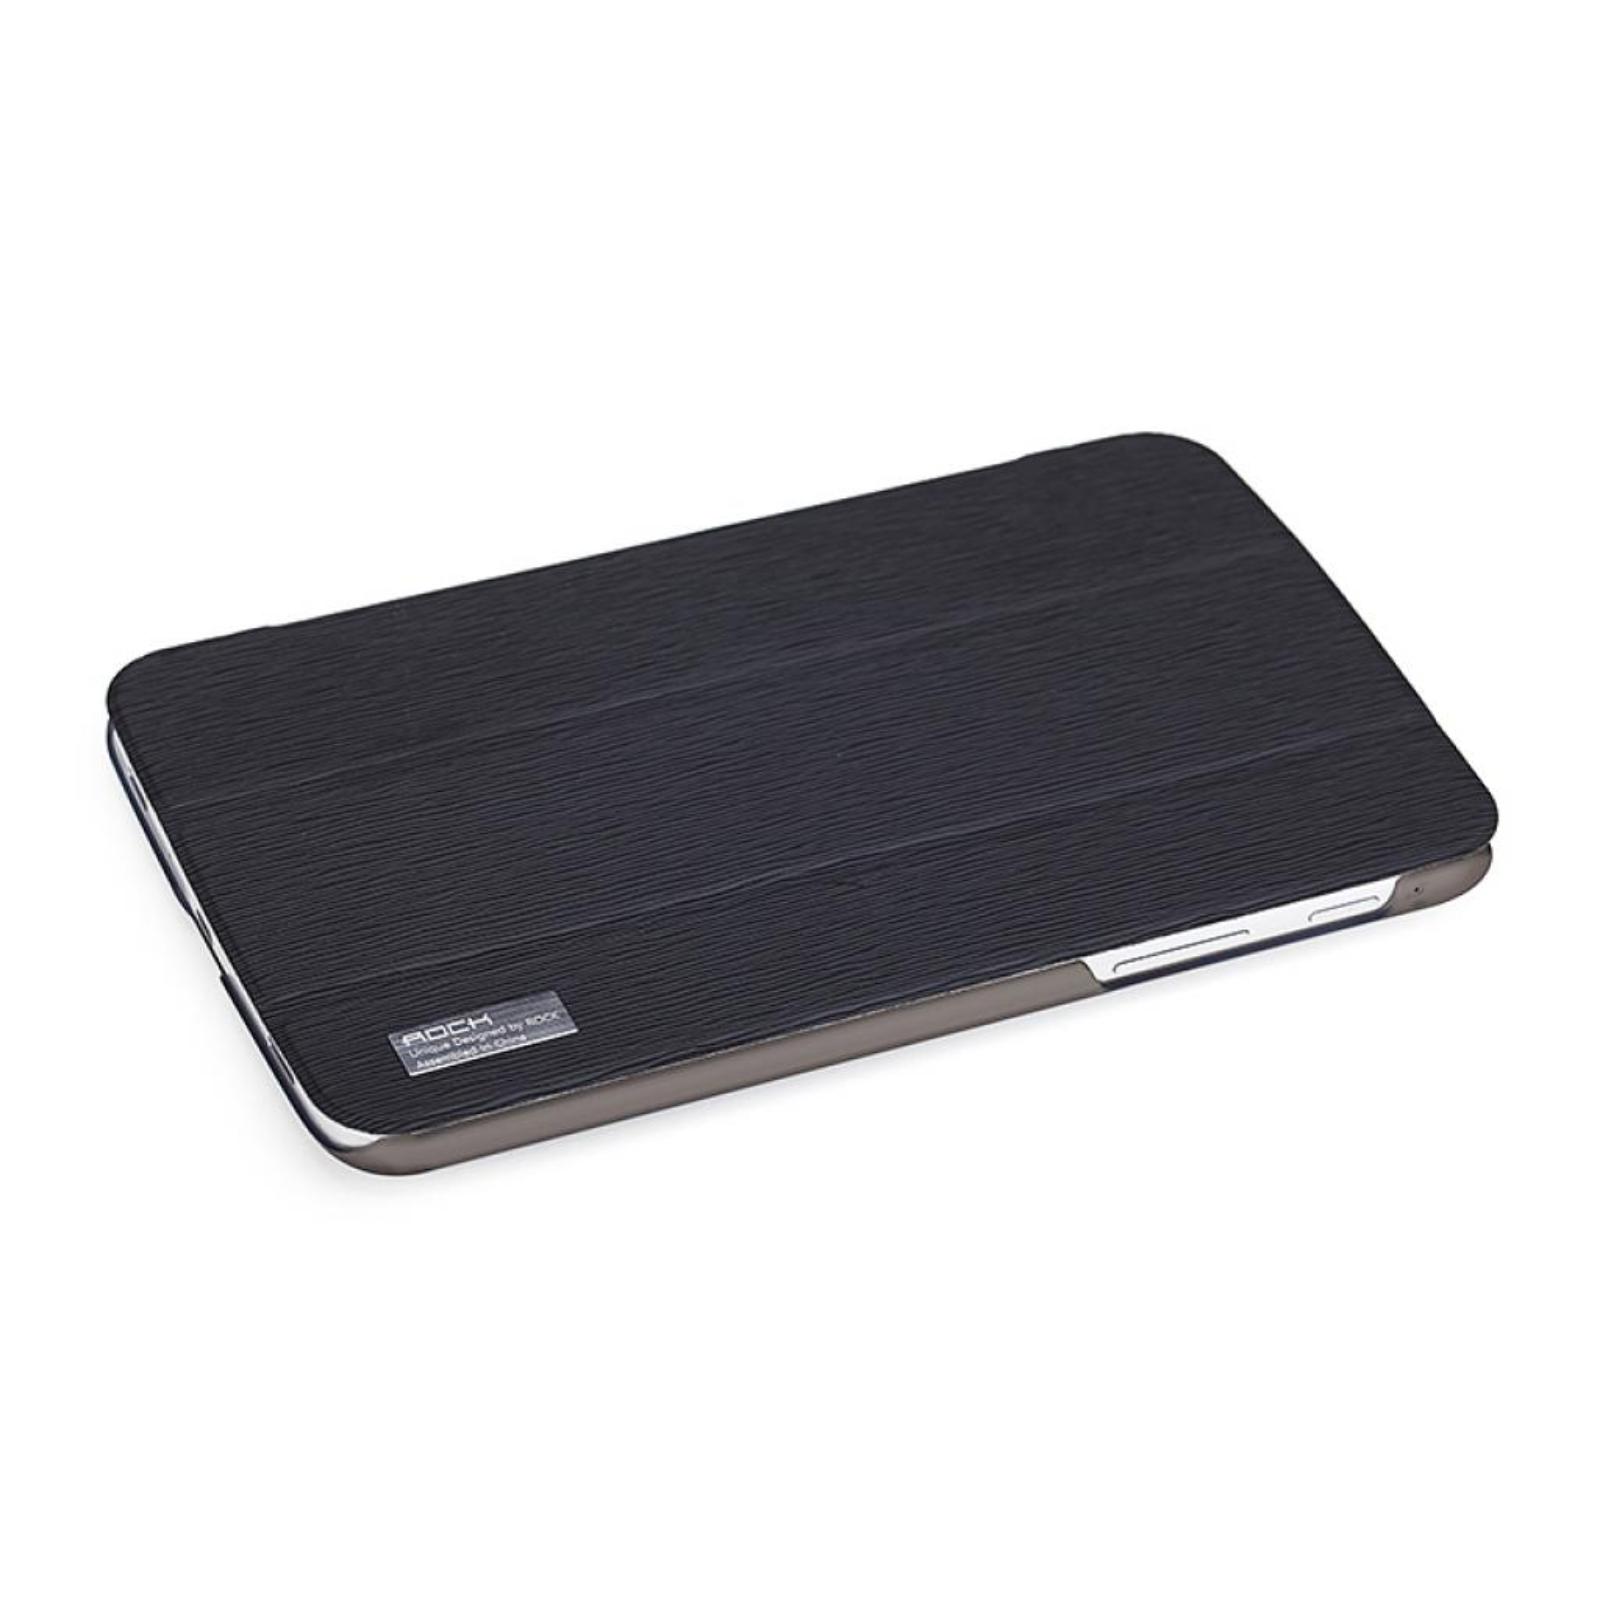 "Чехол для планшета Rock 7"" Samsung Galaxy Tab 3 7.0 T2100/T2110 Elegant Series (31849 black) изображение 3"